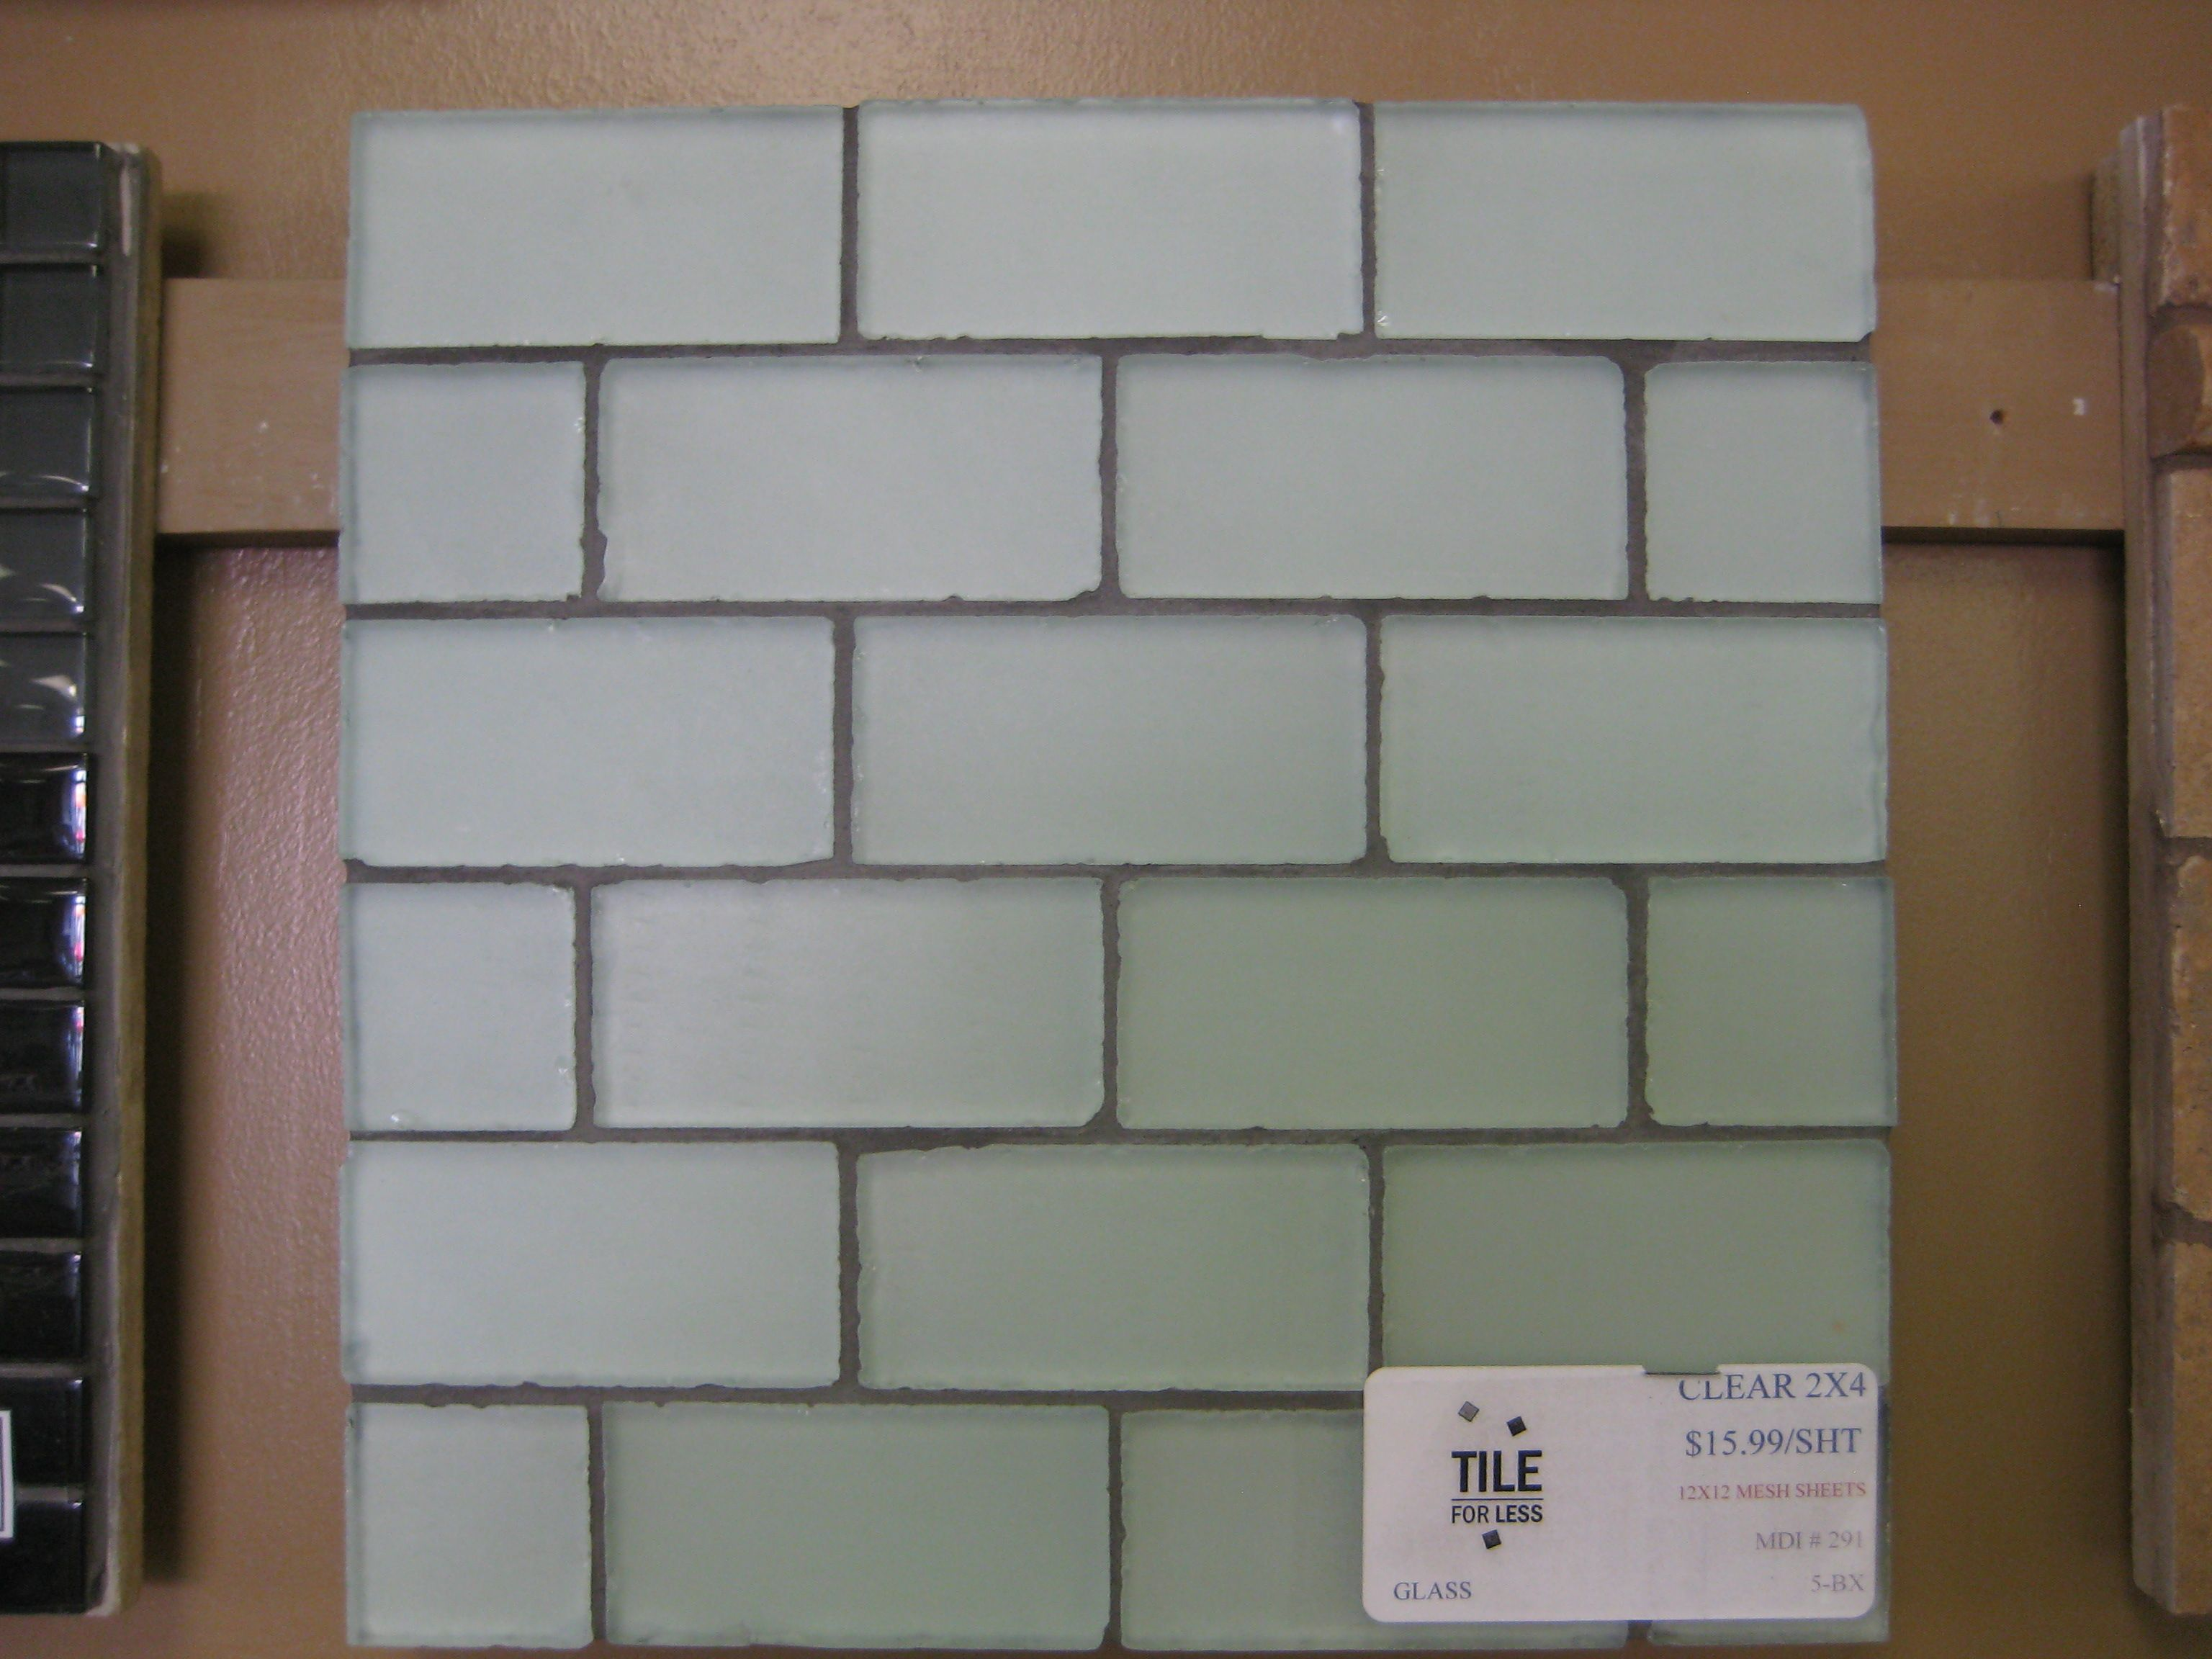 Tile choices | Kitchen ideas | Pinterest | Grey tiles, Bathroom ...